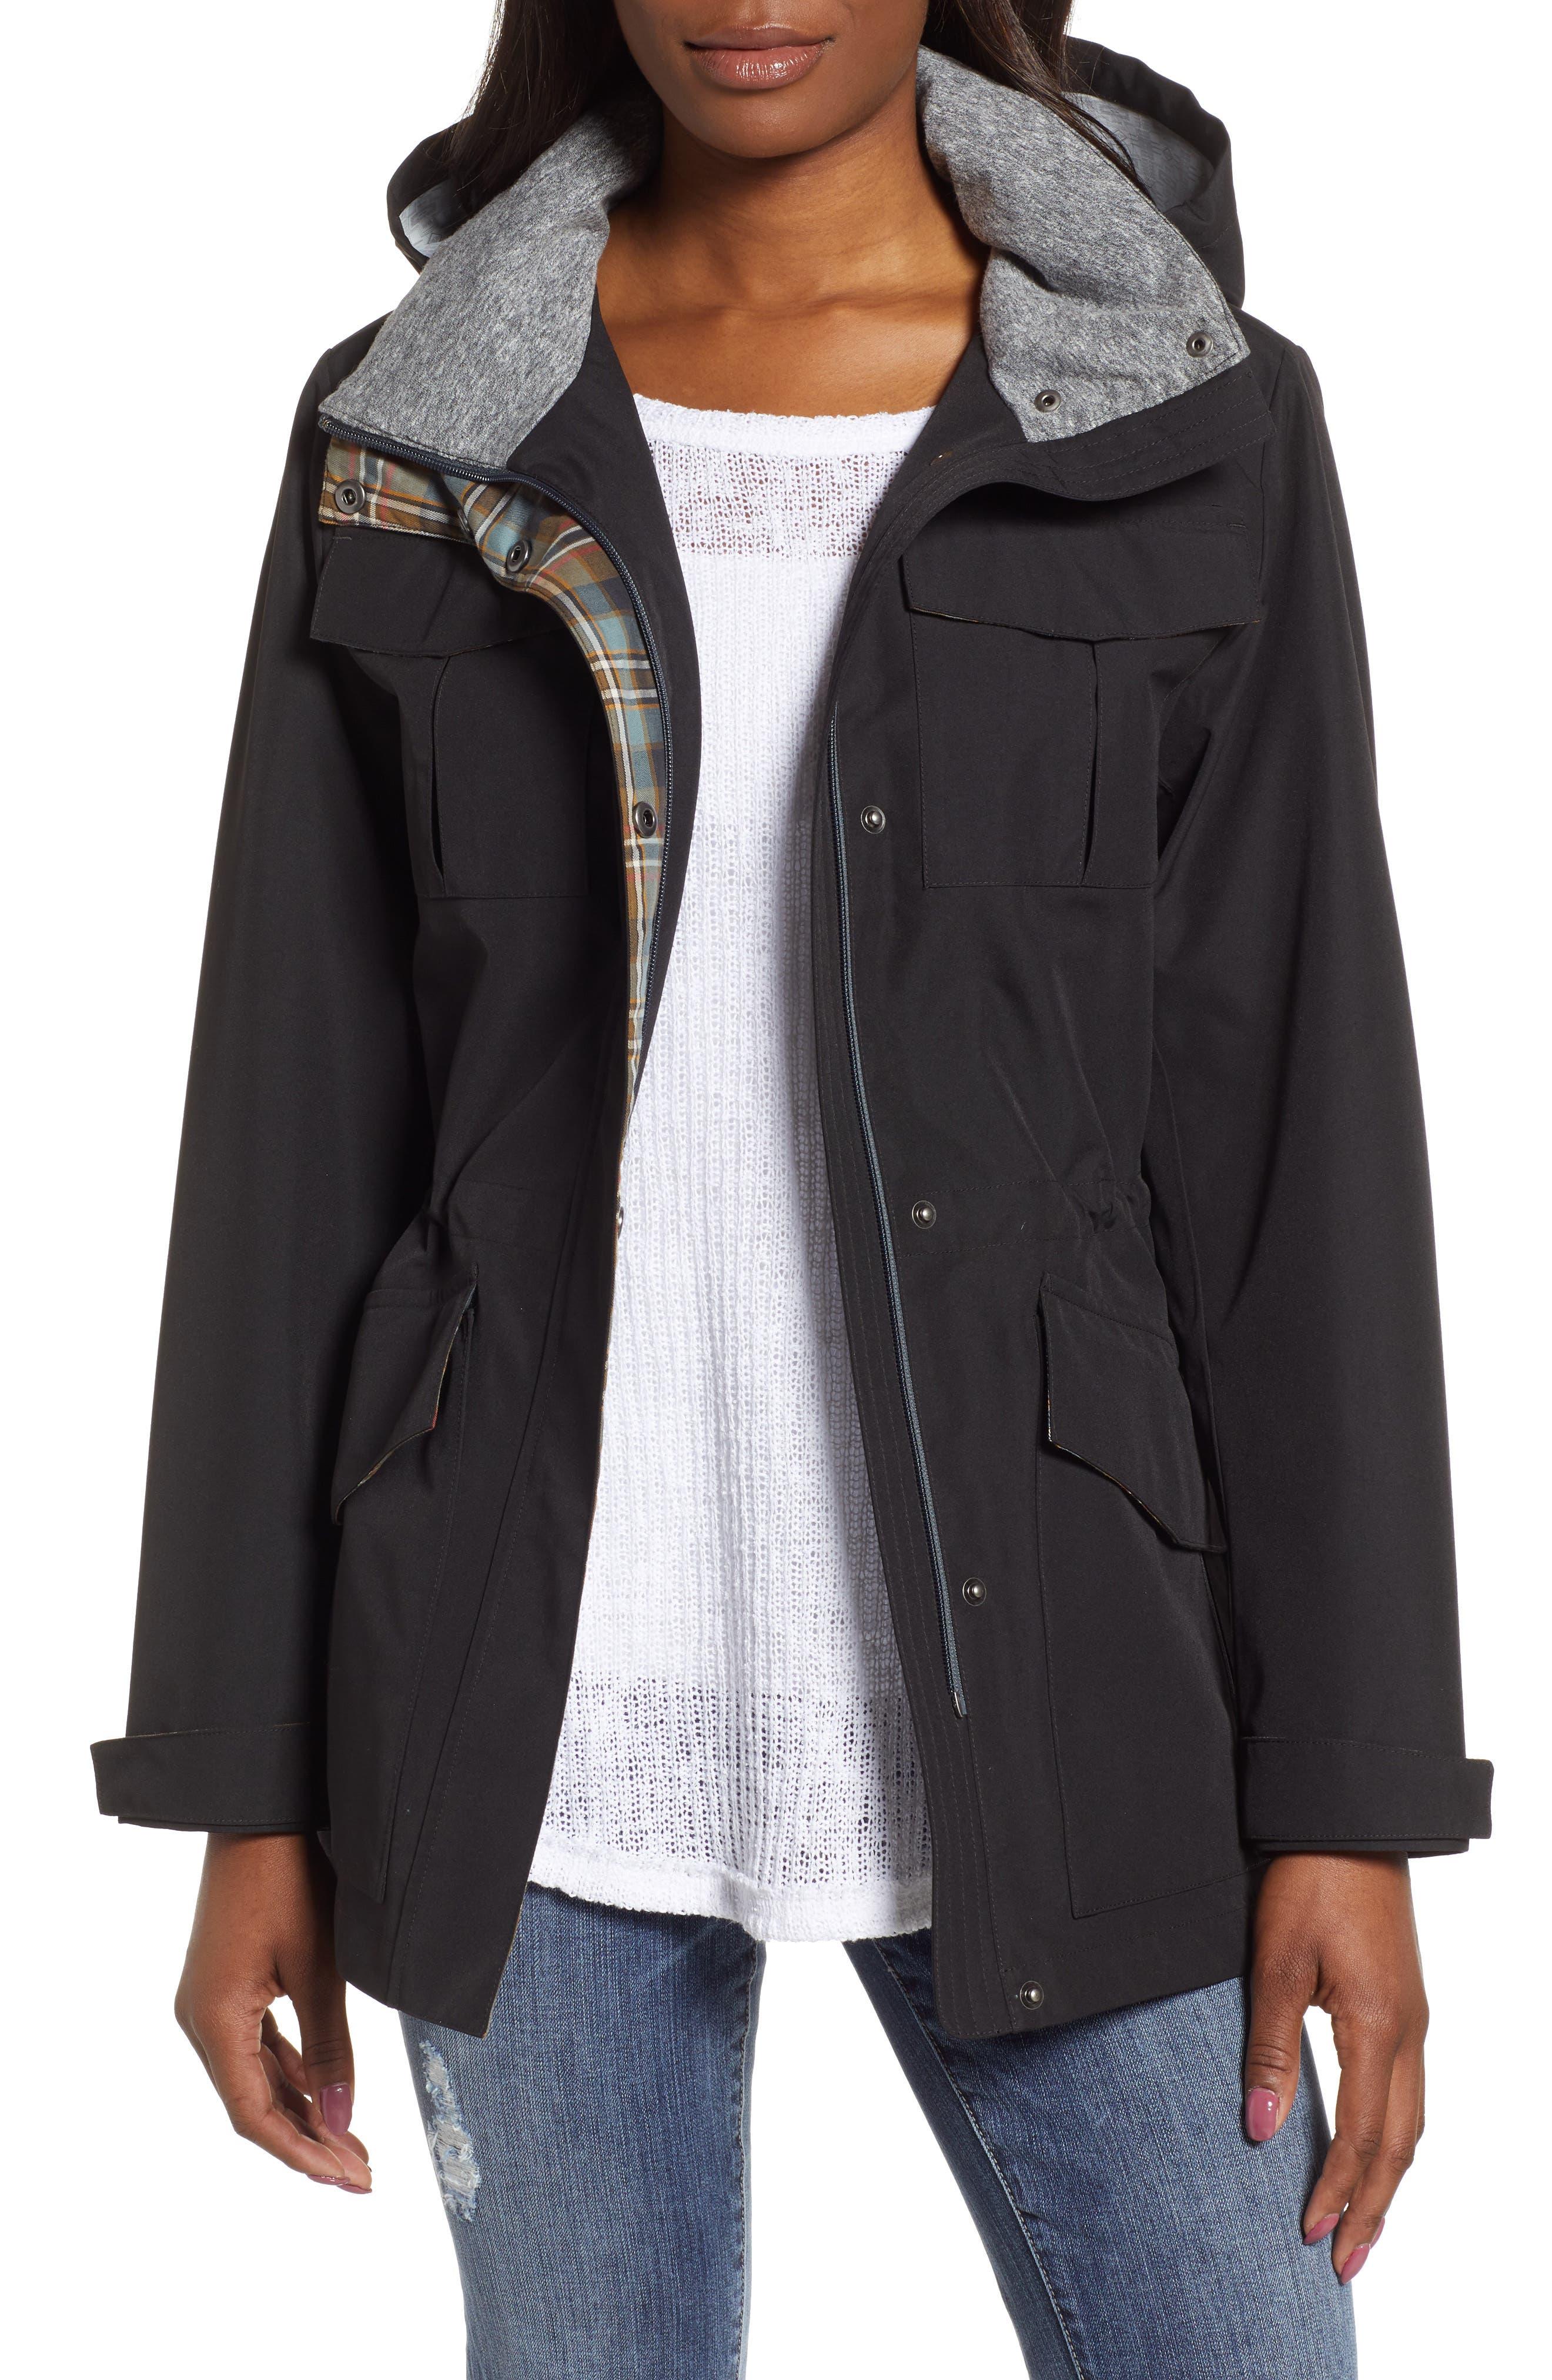 Pendleton Lihn Hooded Utility Jacket Nordstrom Rack [ 4048 x 2640 Pixel ]